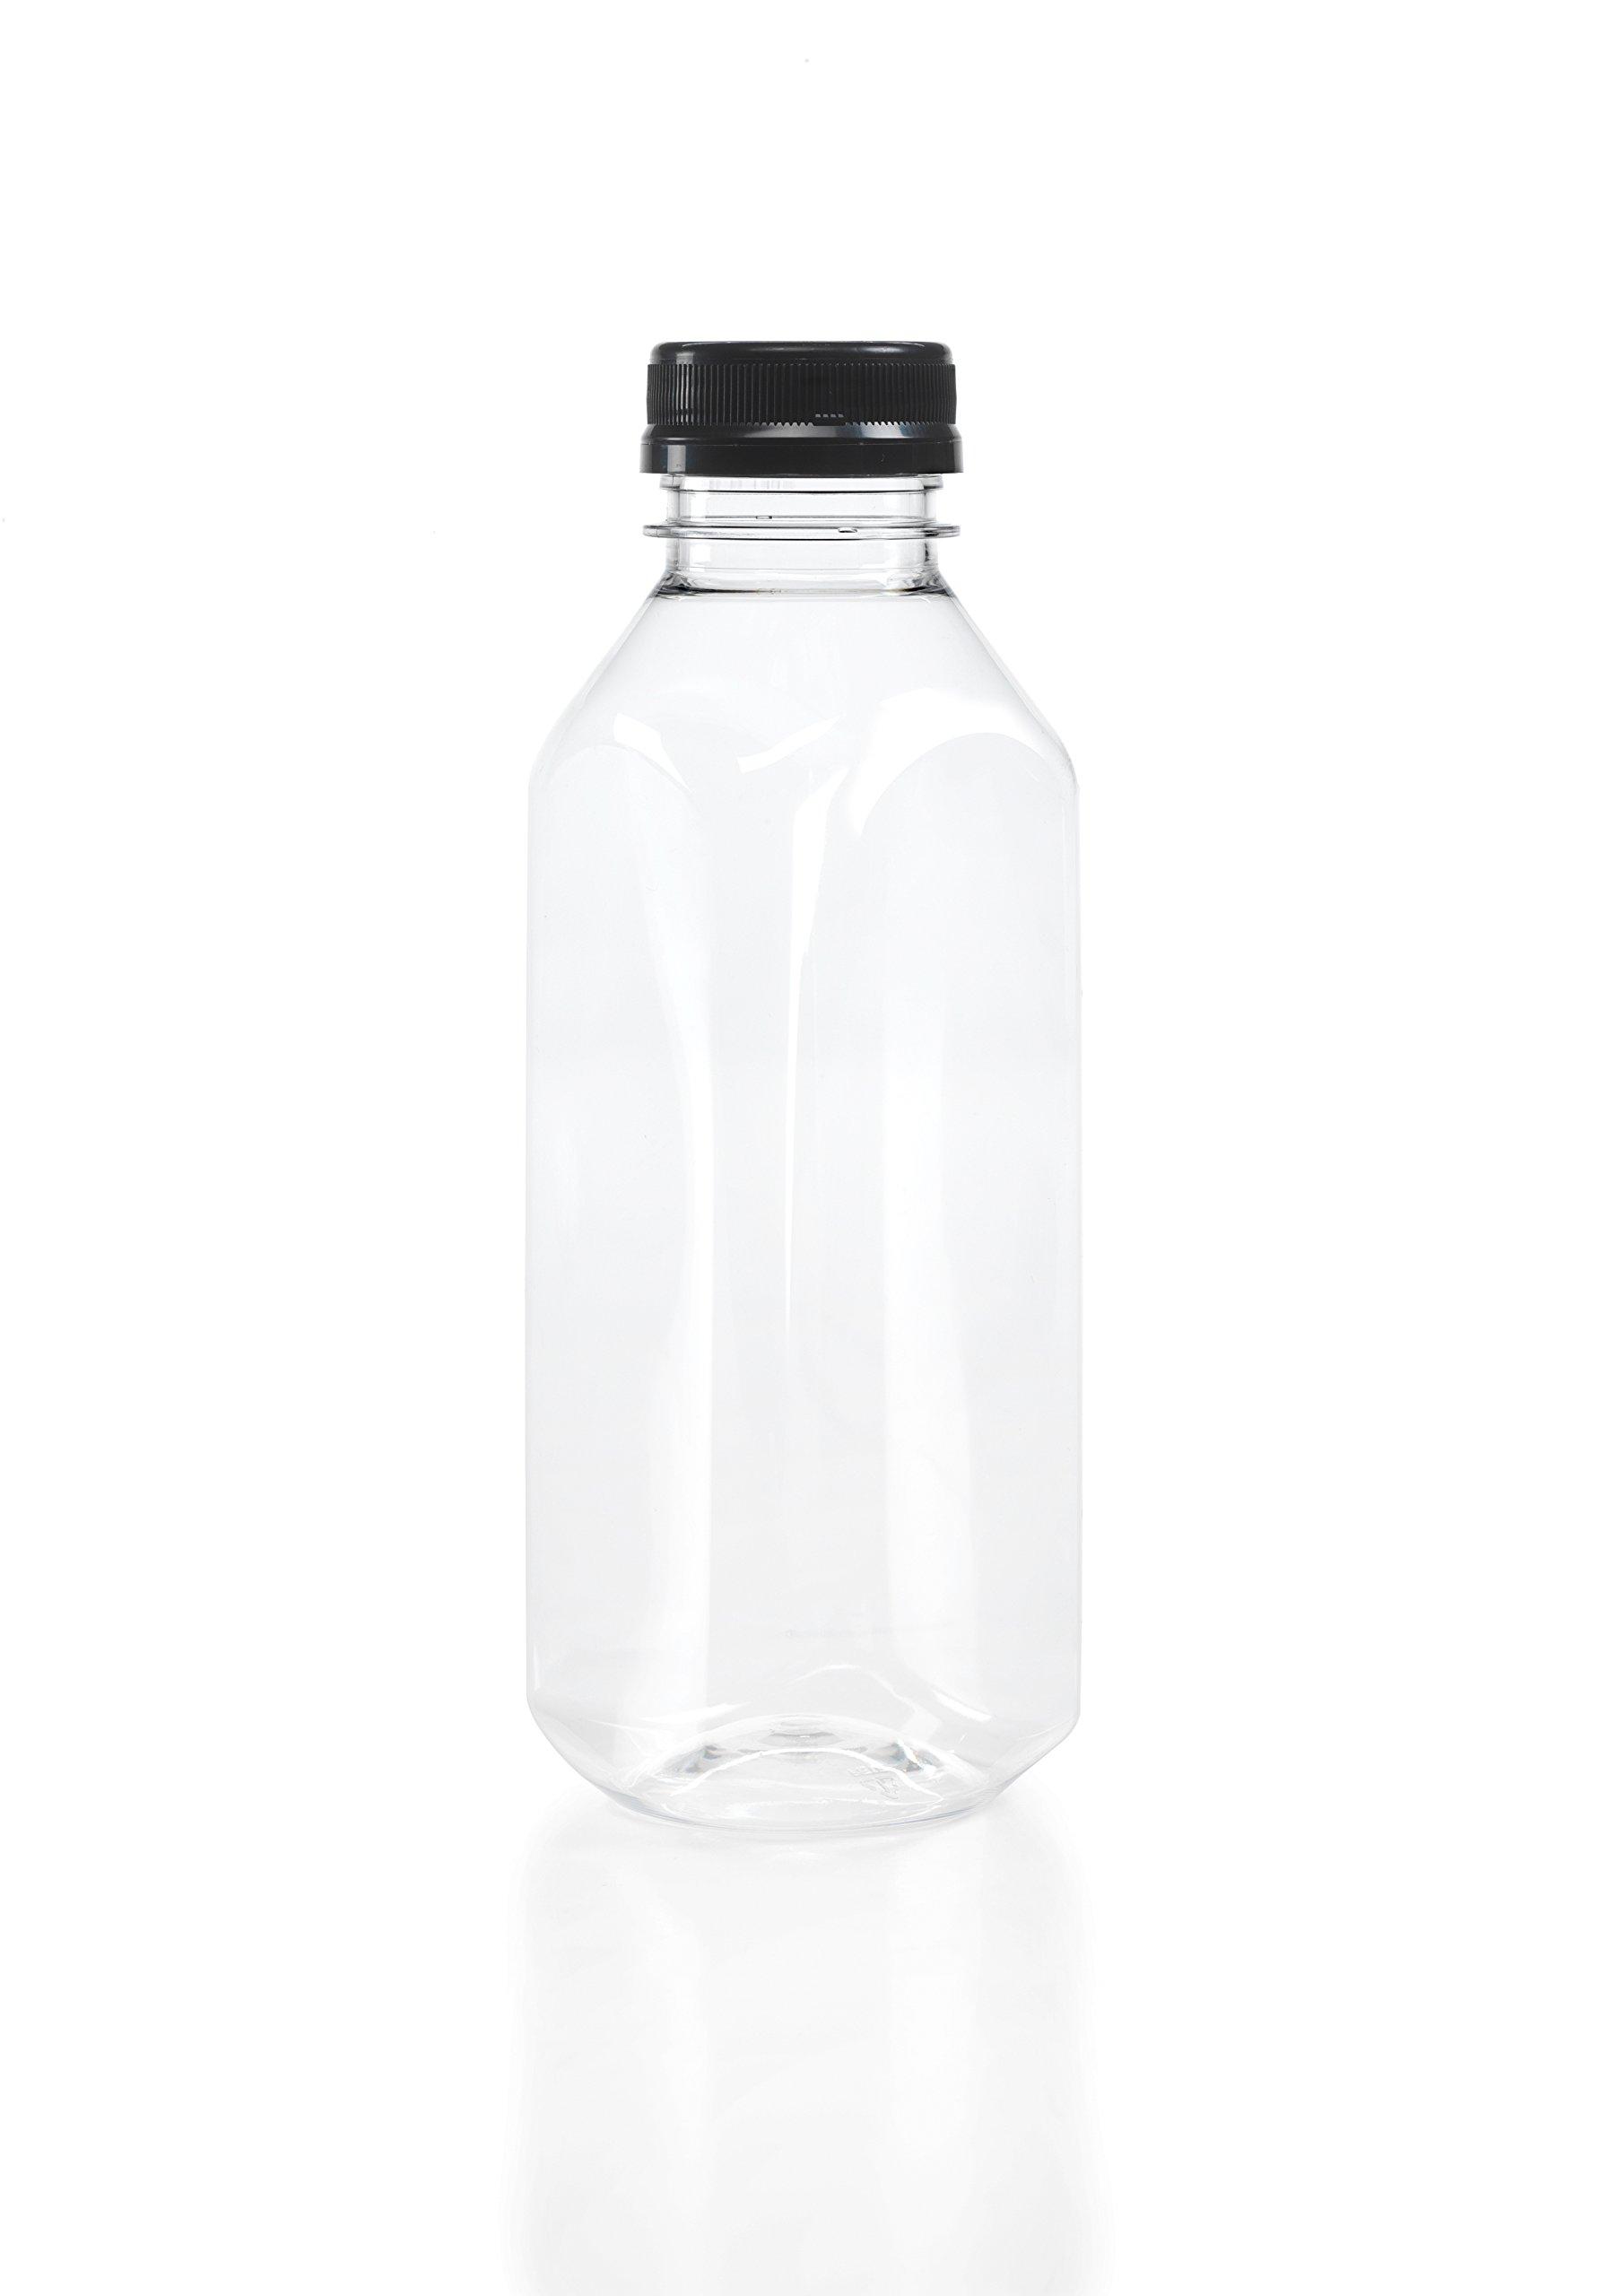 (8) 16 oz. Clear Food Grade Plastic Juice Bottles with Tamper Evident Caps 8/pack (Black Lids) by Juce Jugz